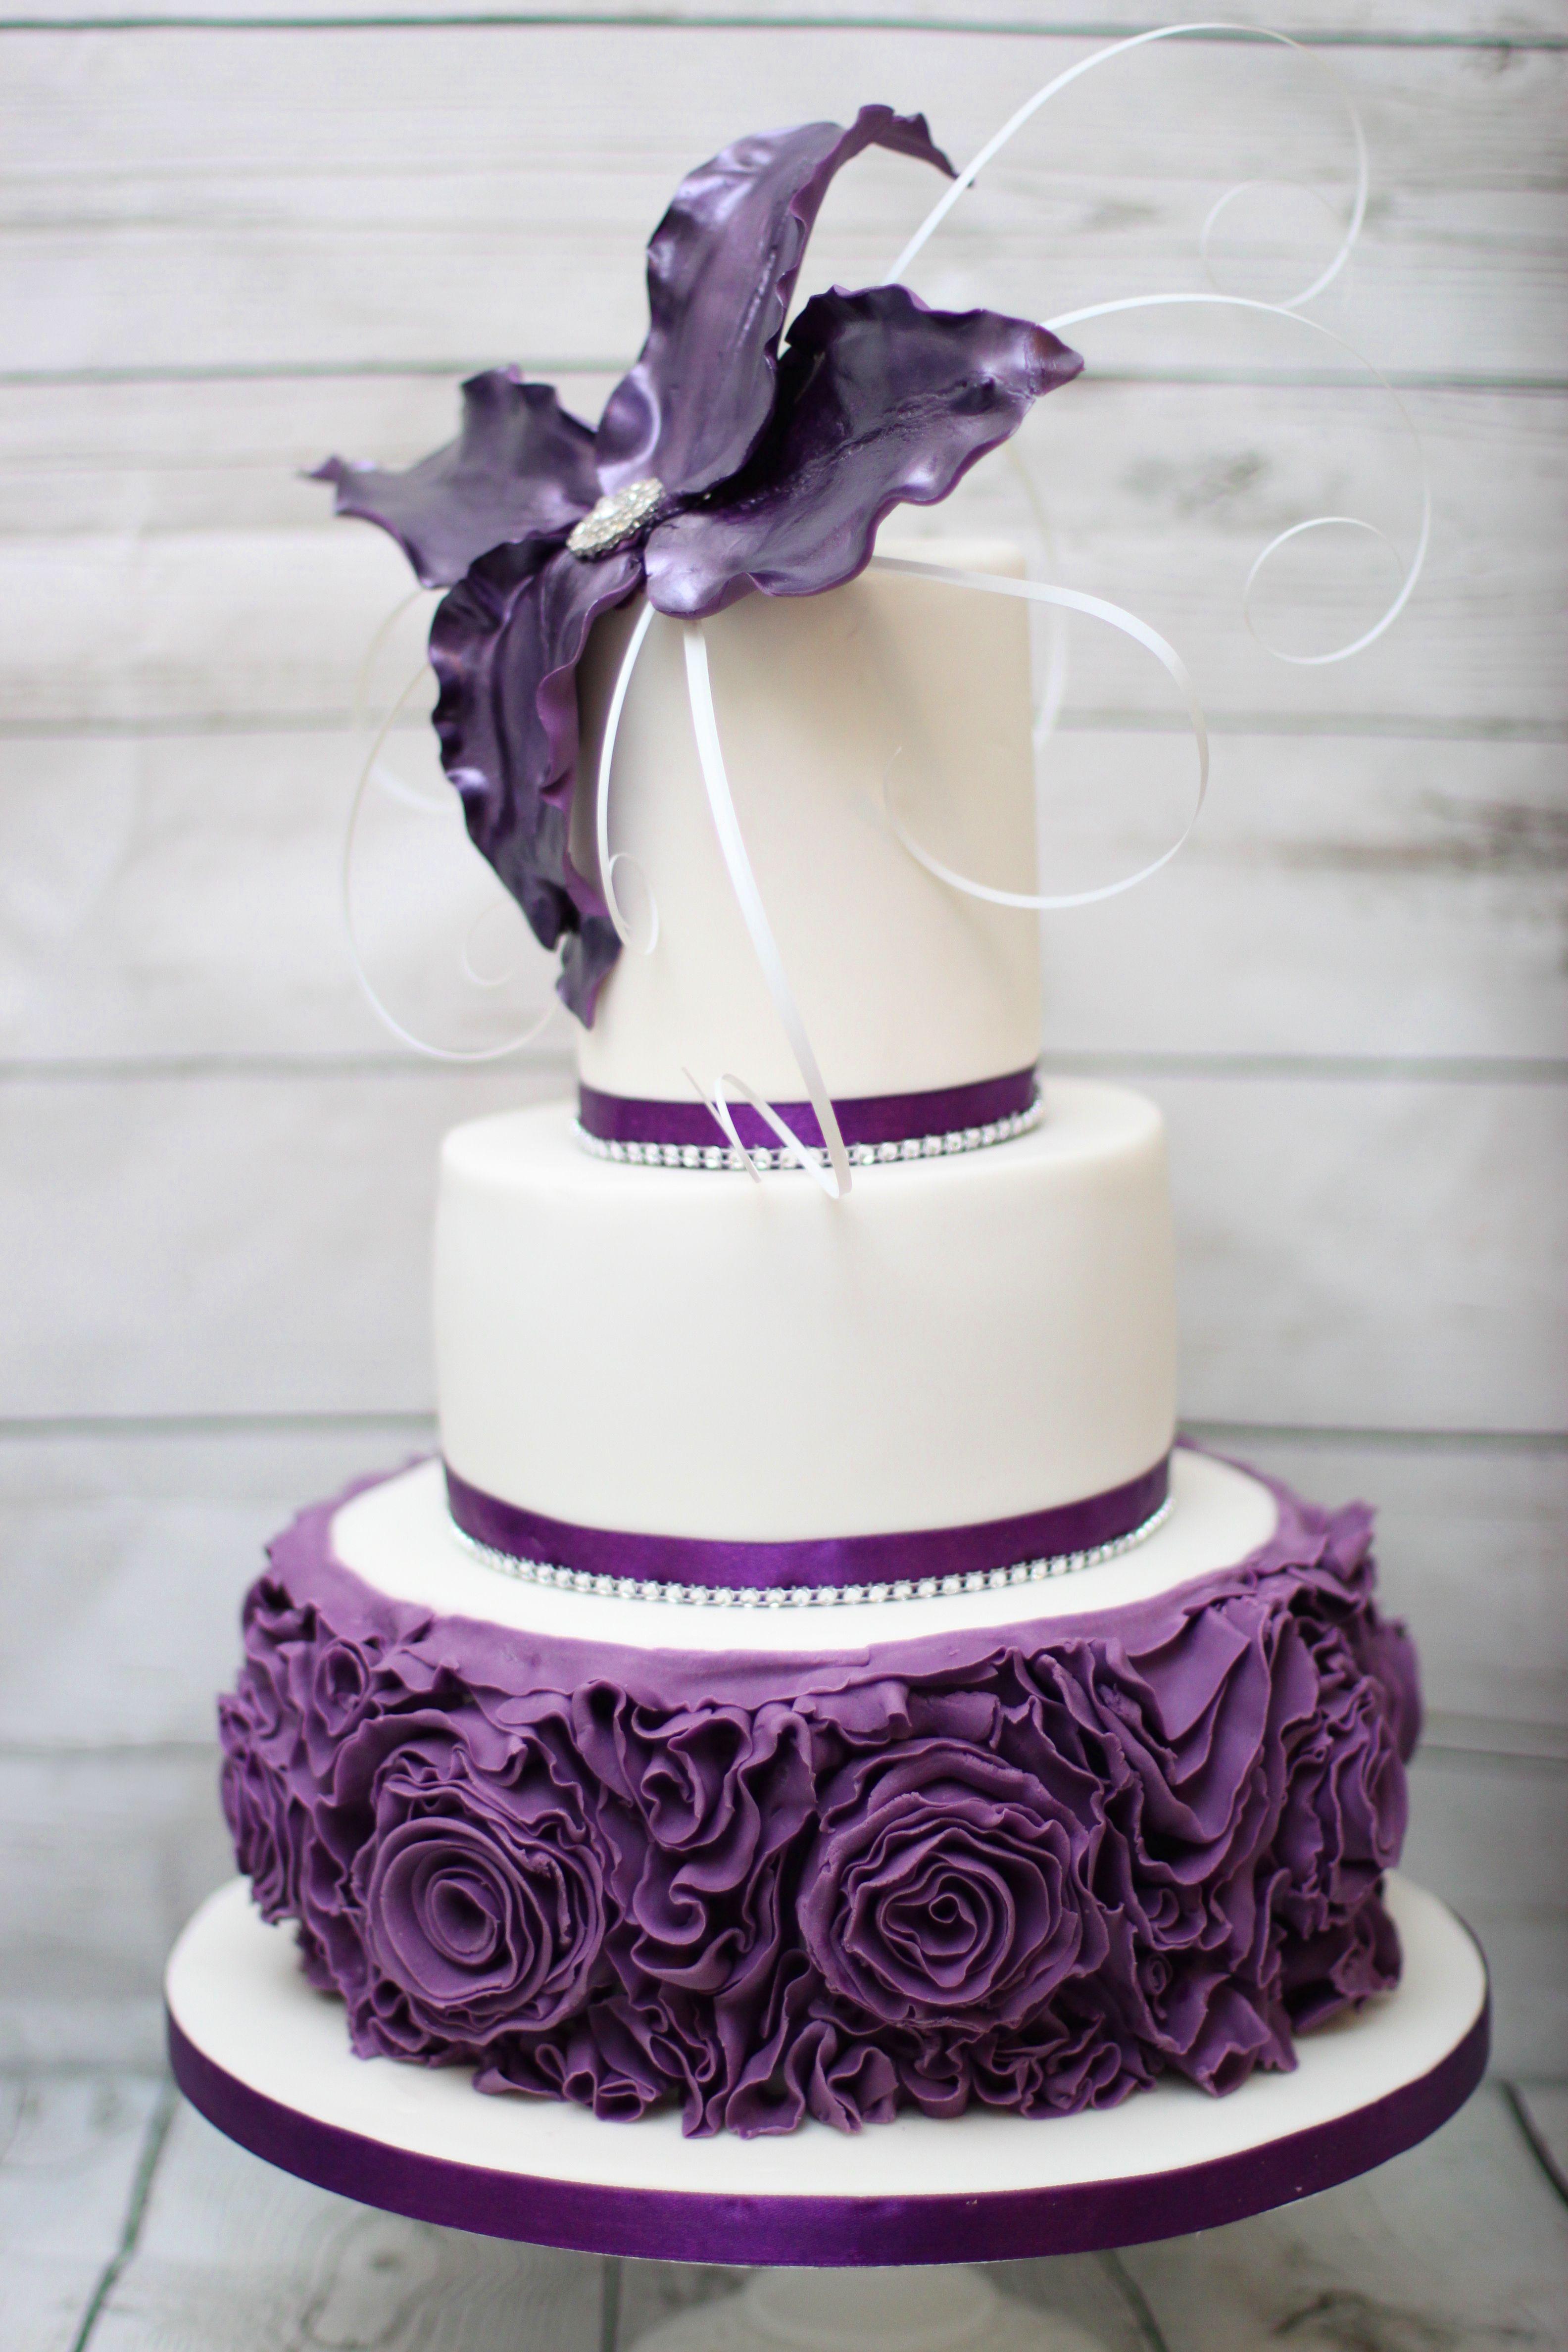 3 Tier Cadbury S Purple Birthday Cake Ruffle Roses And